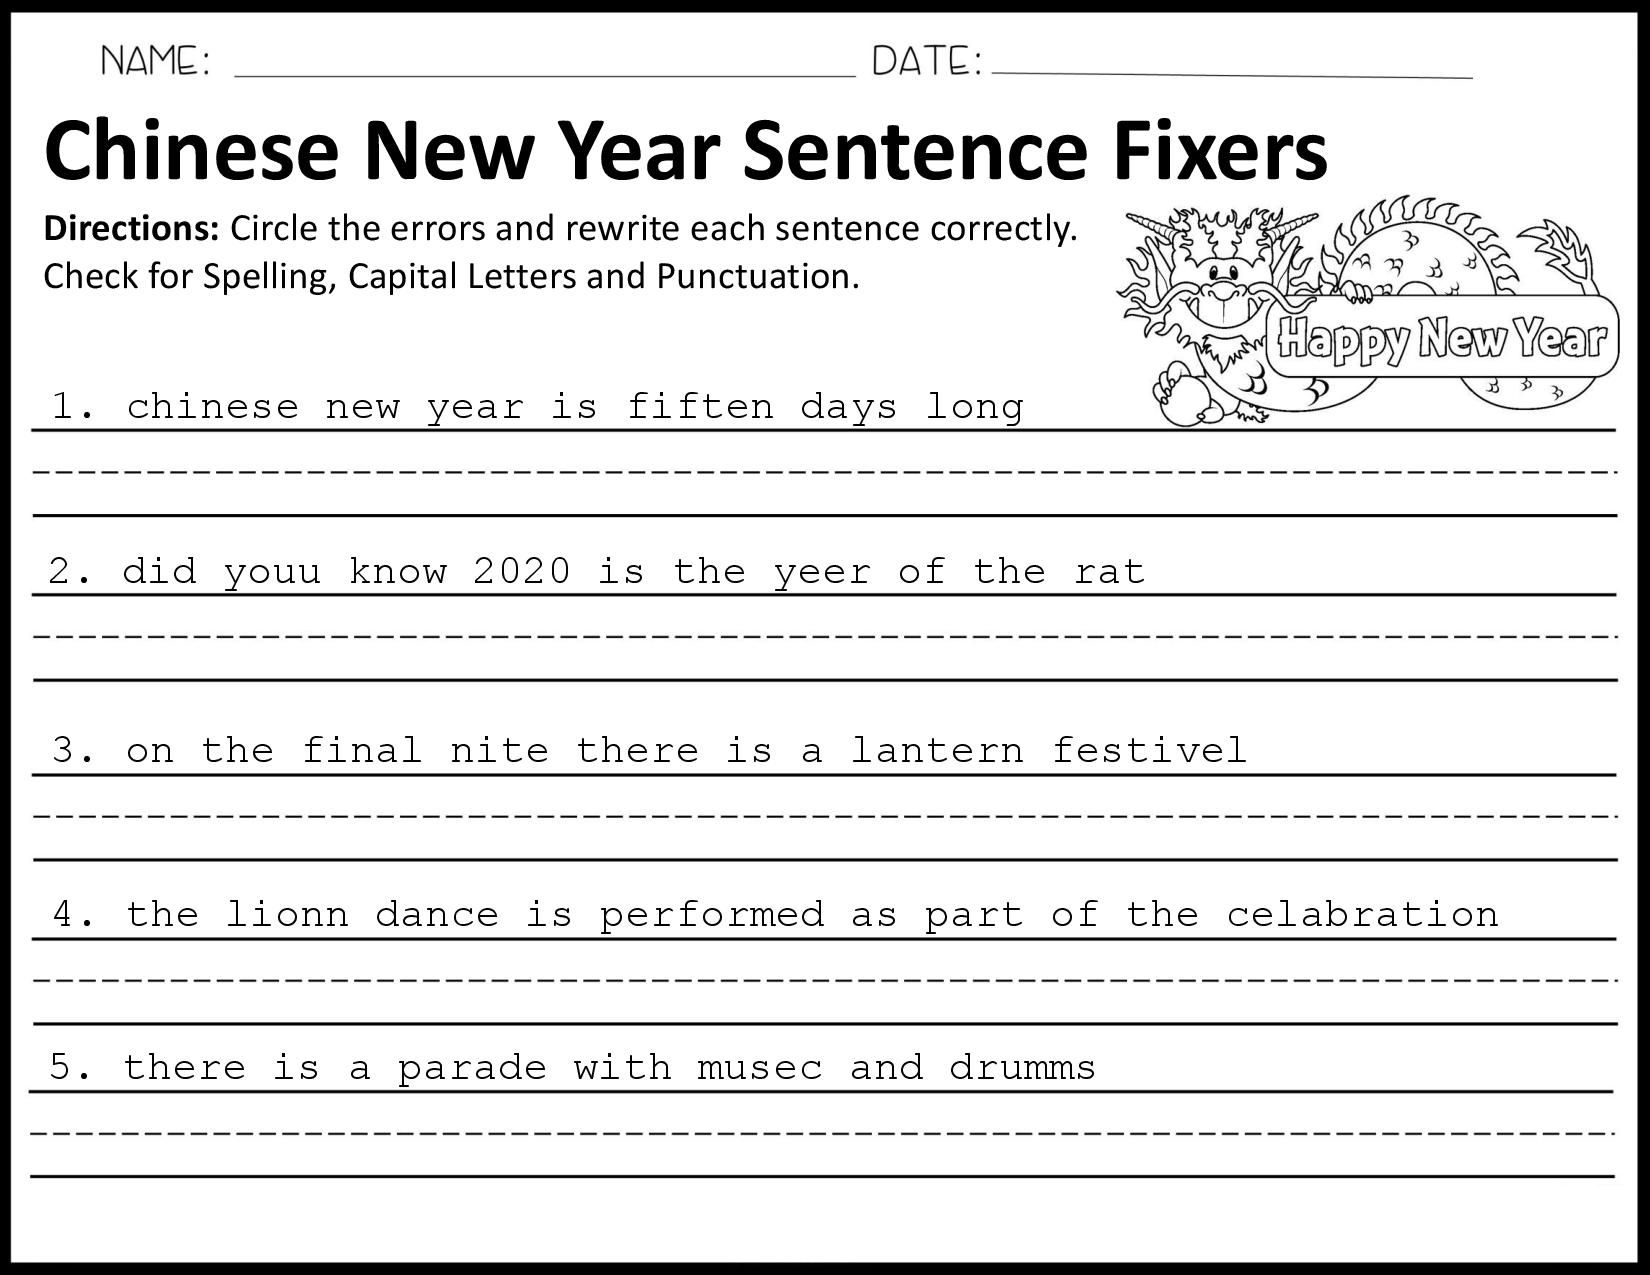 Chinese New Year Sentence Fixers Sentence fixer, Chinese